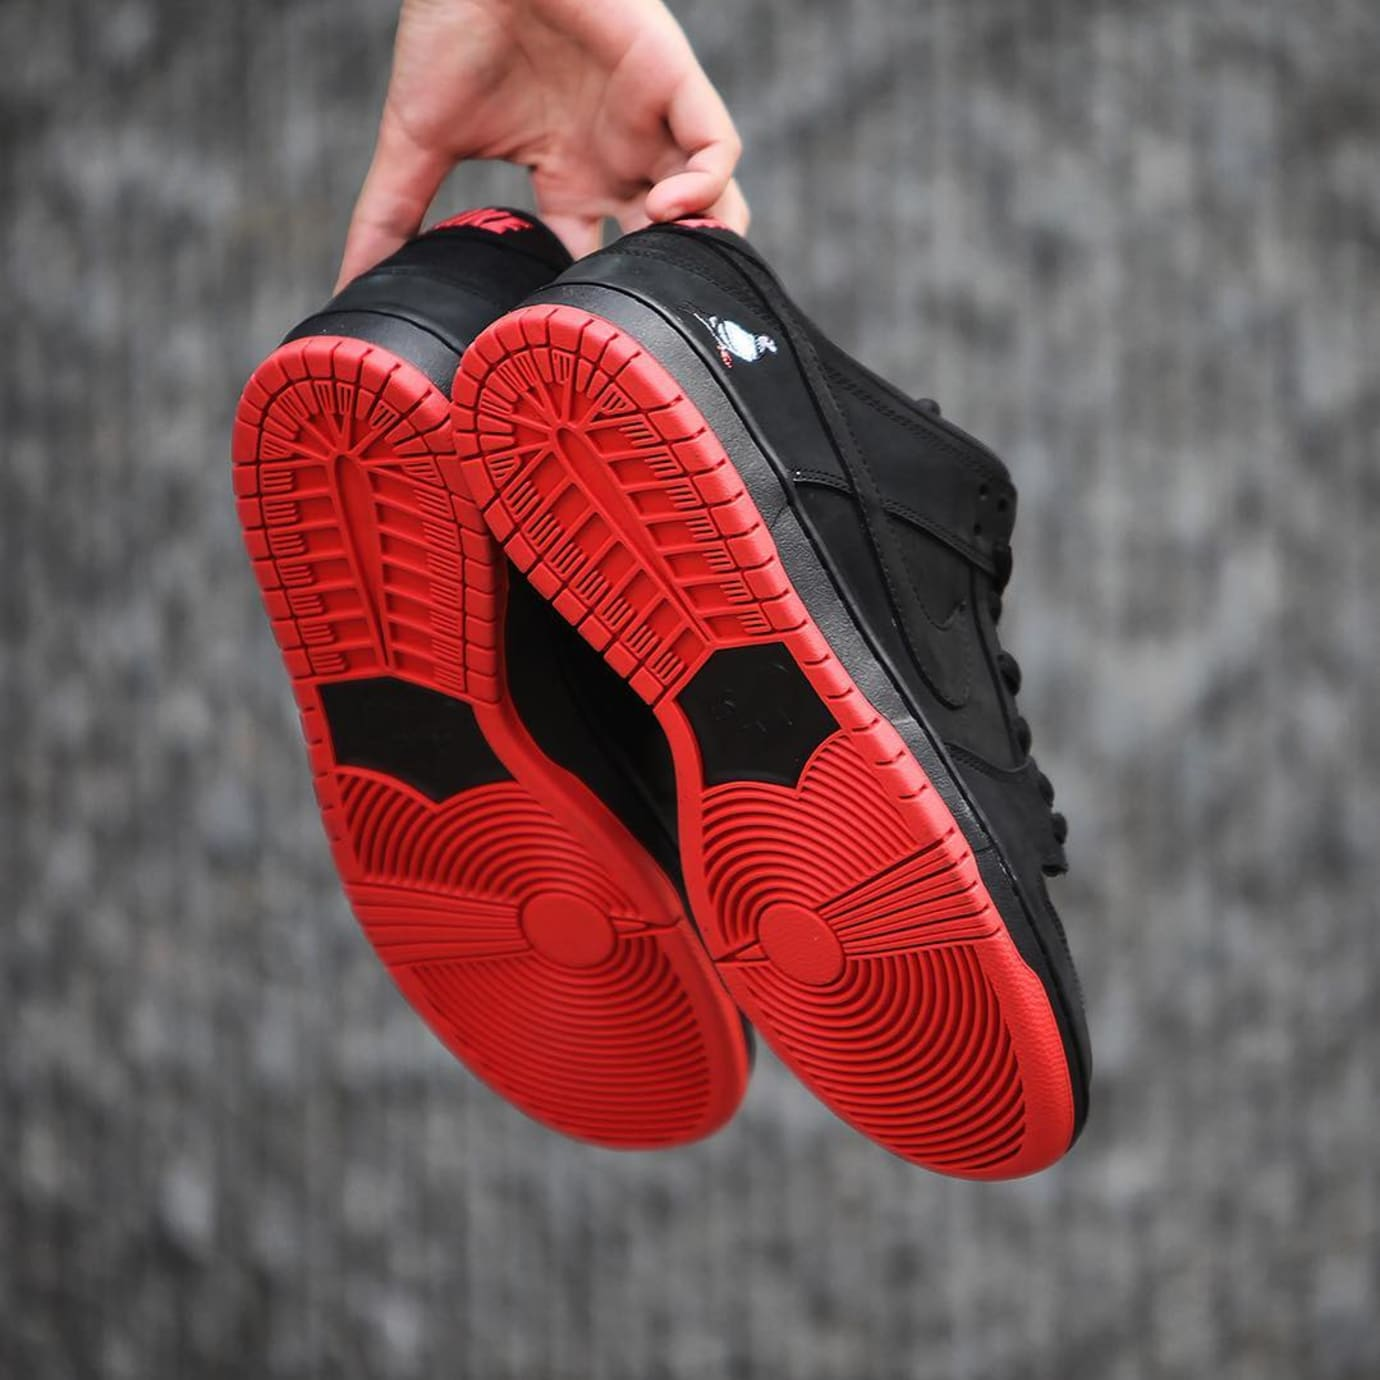 Nike SB Dunk Low Black Pigeon Release Date 88323-008 (8)